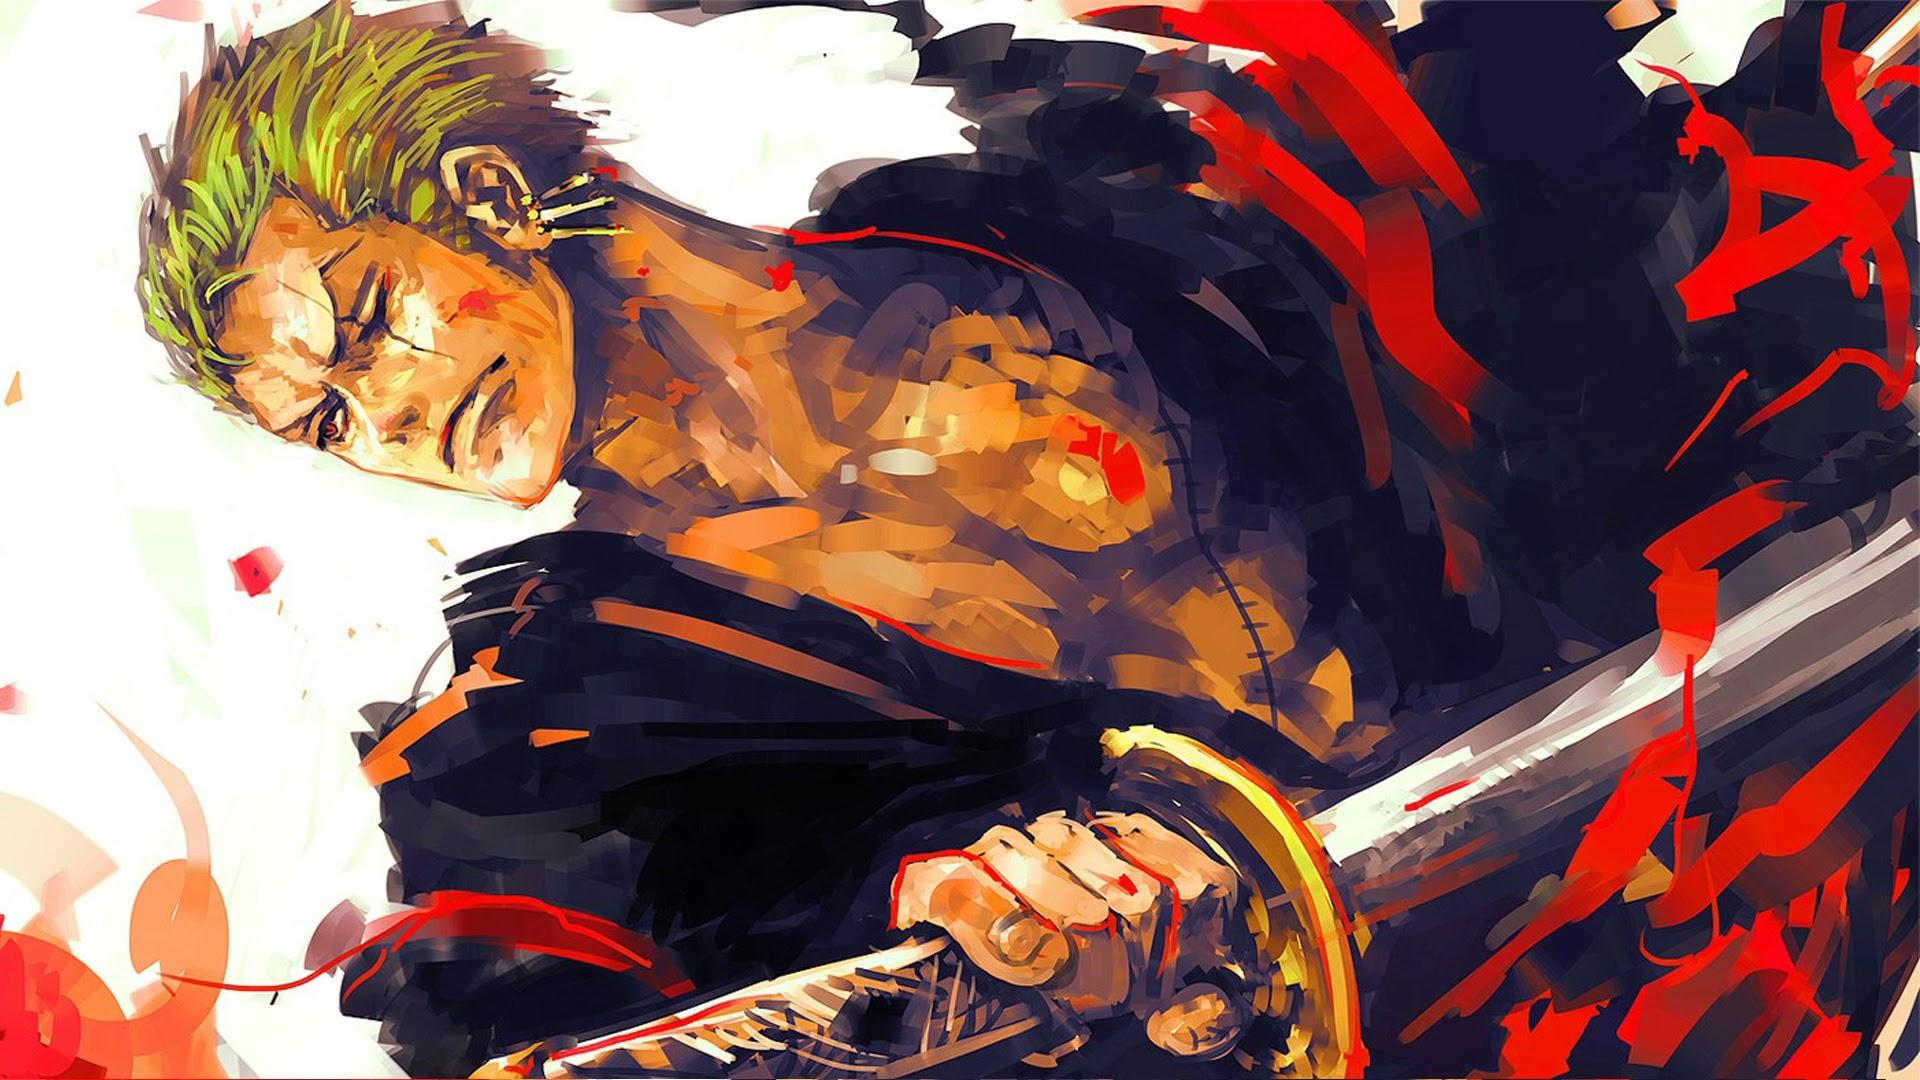 Roronoa Zoro One Piece Anime 2t Wallpaper HD 1920x1080